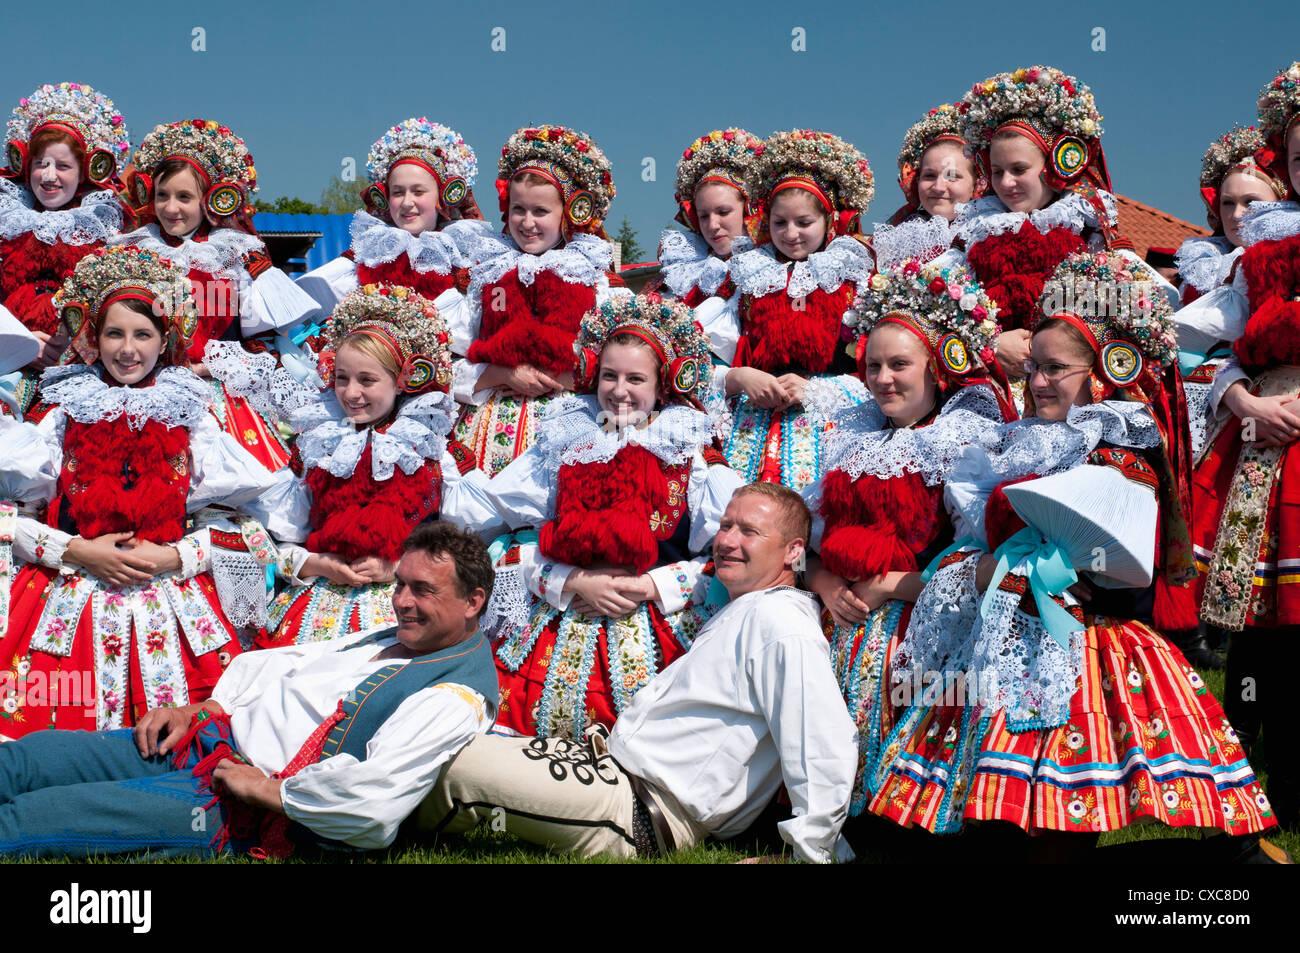 Girls and men wearing folk dress, The Ride of the Kings festival, Vlcnov, Zlinsko, Czech Republic, Europe - Stock Image